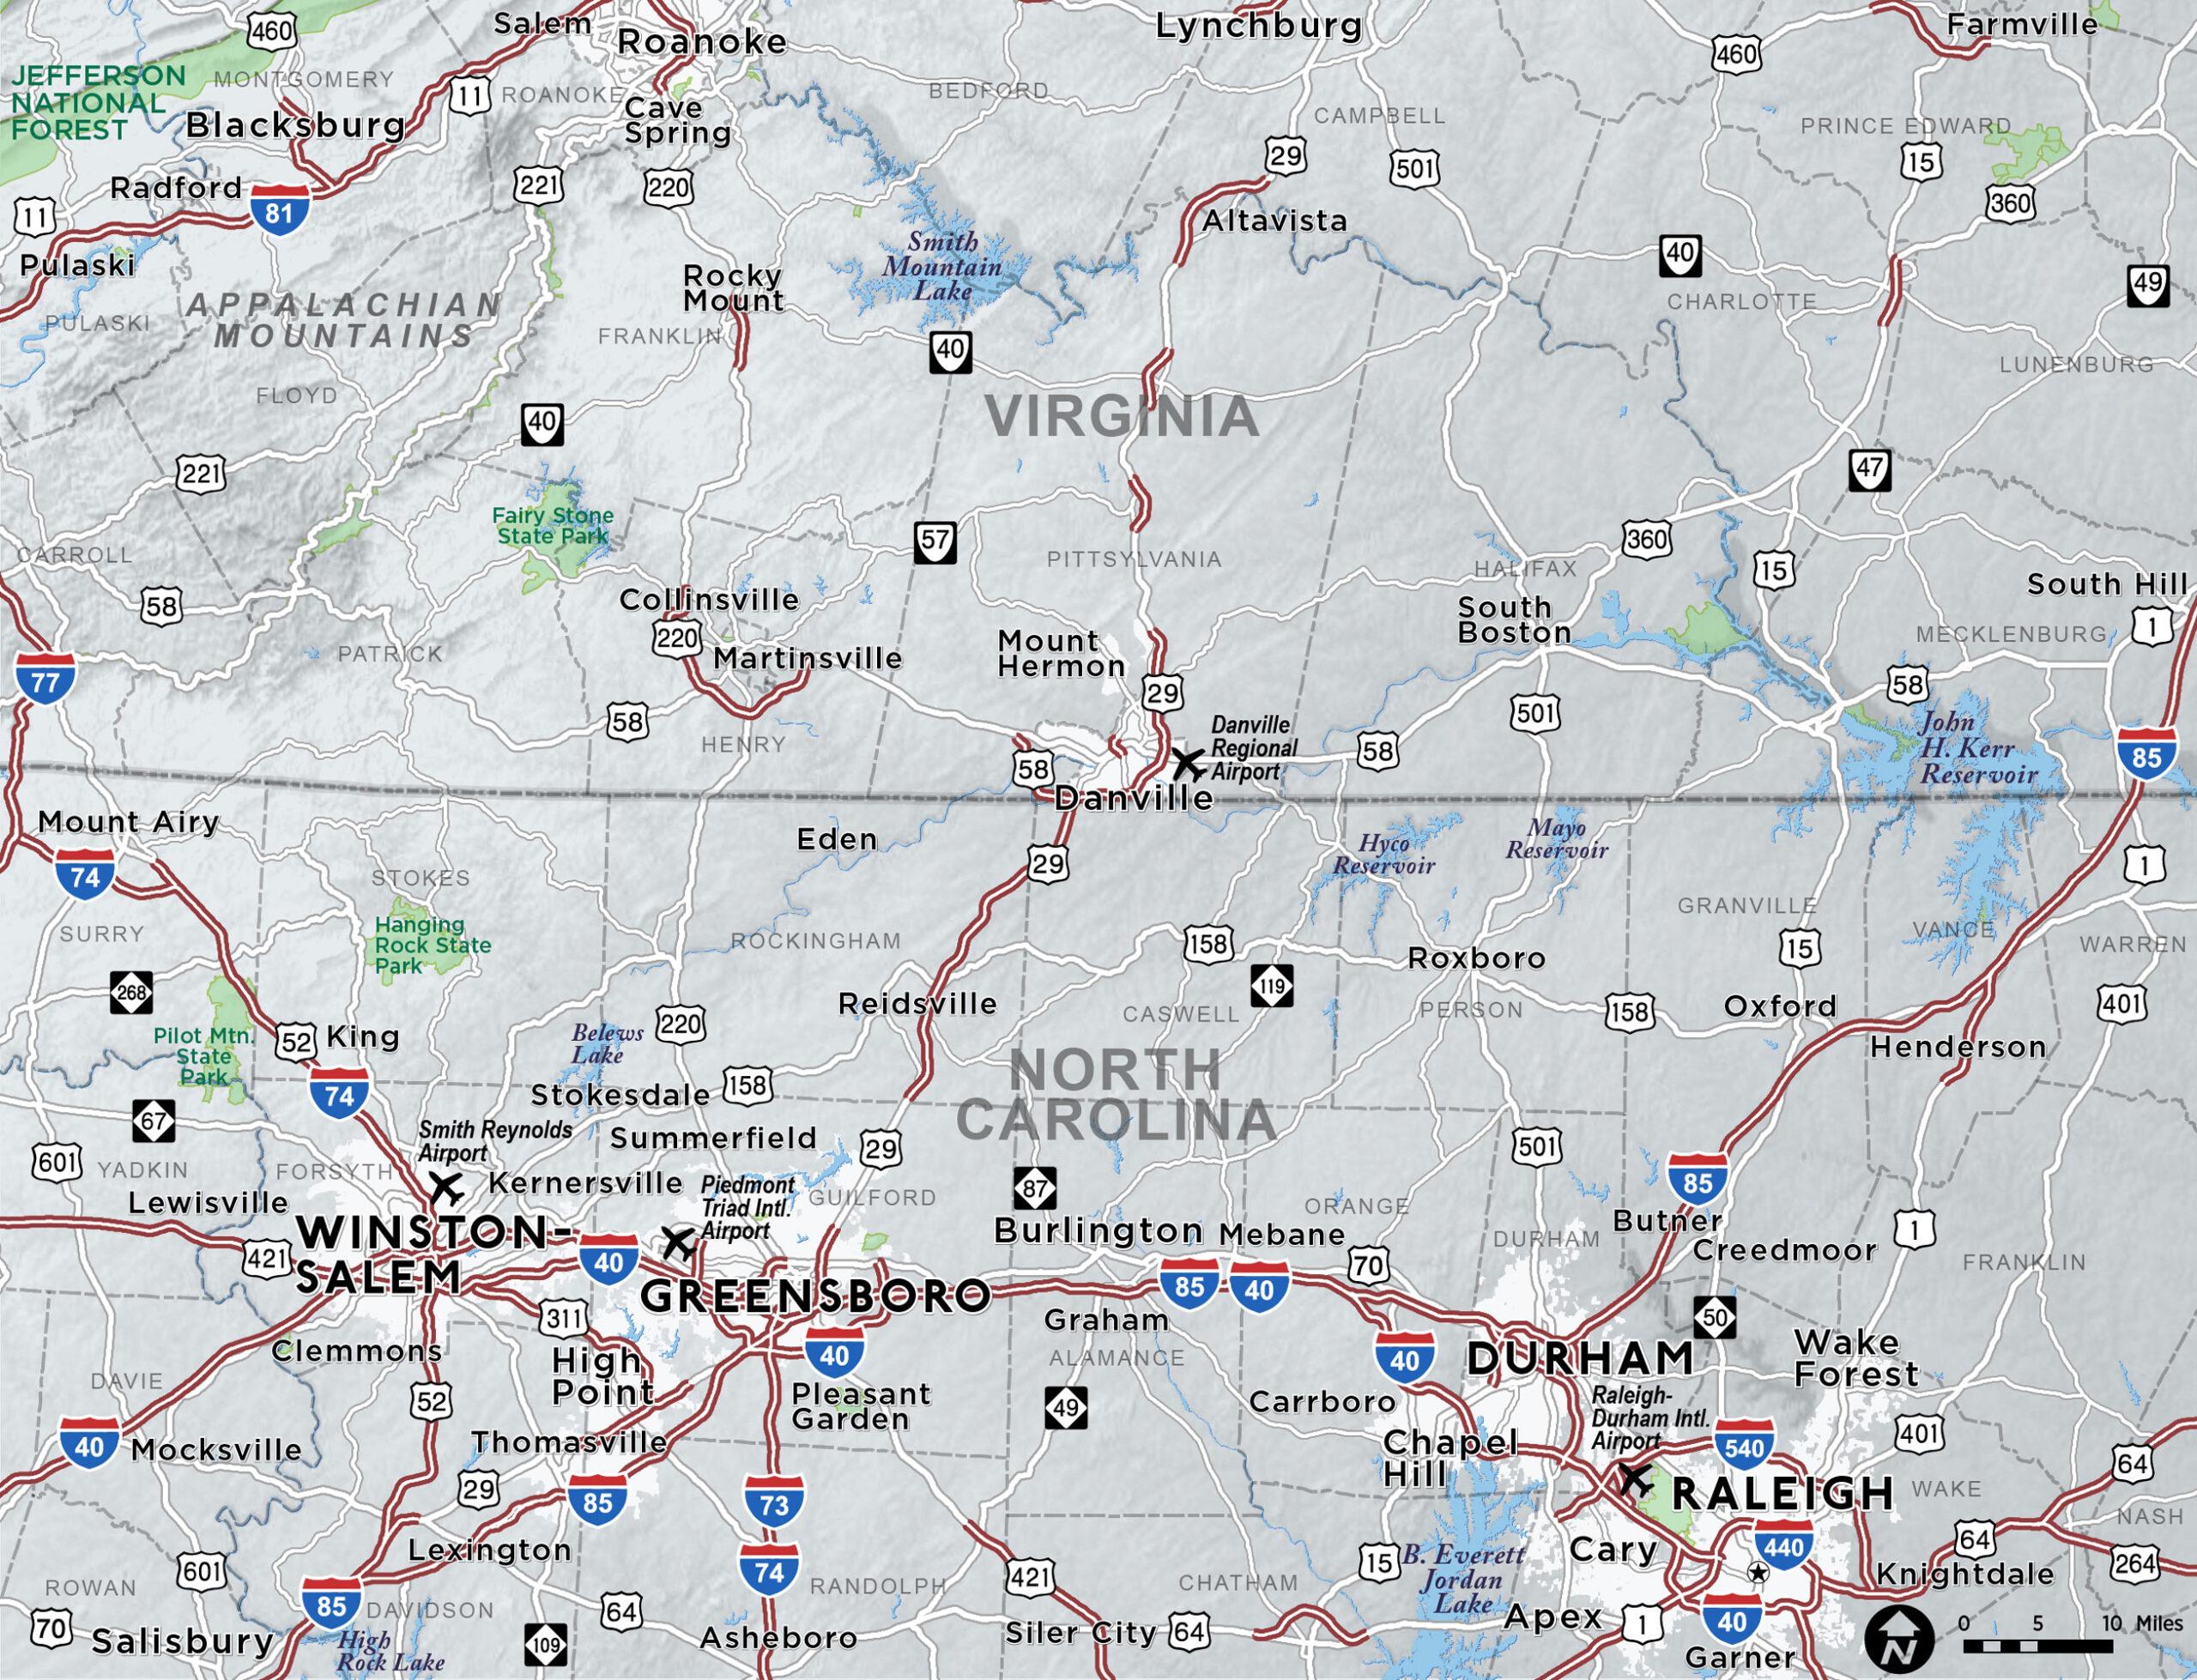 North Carolina/Virginia Border Map